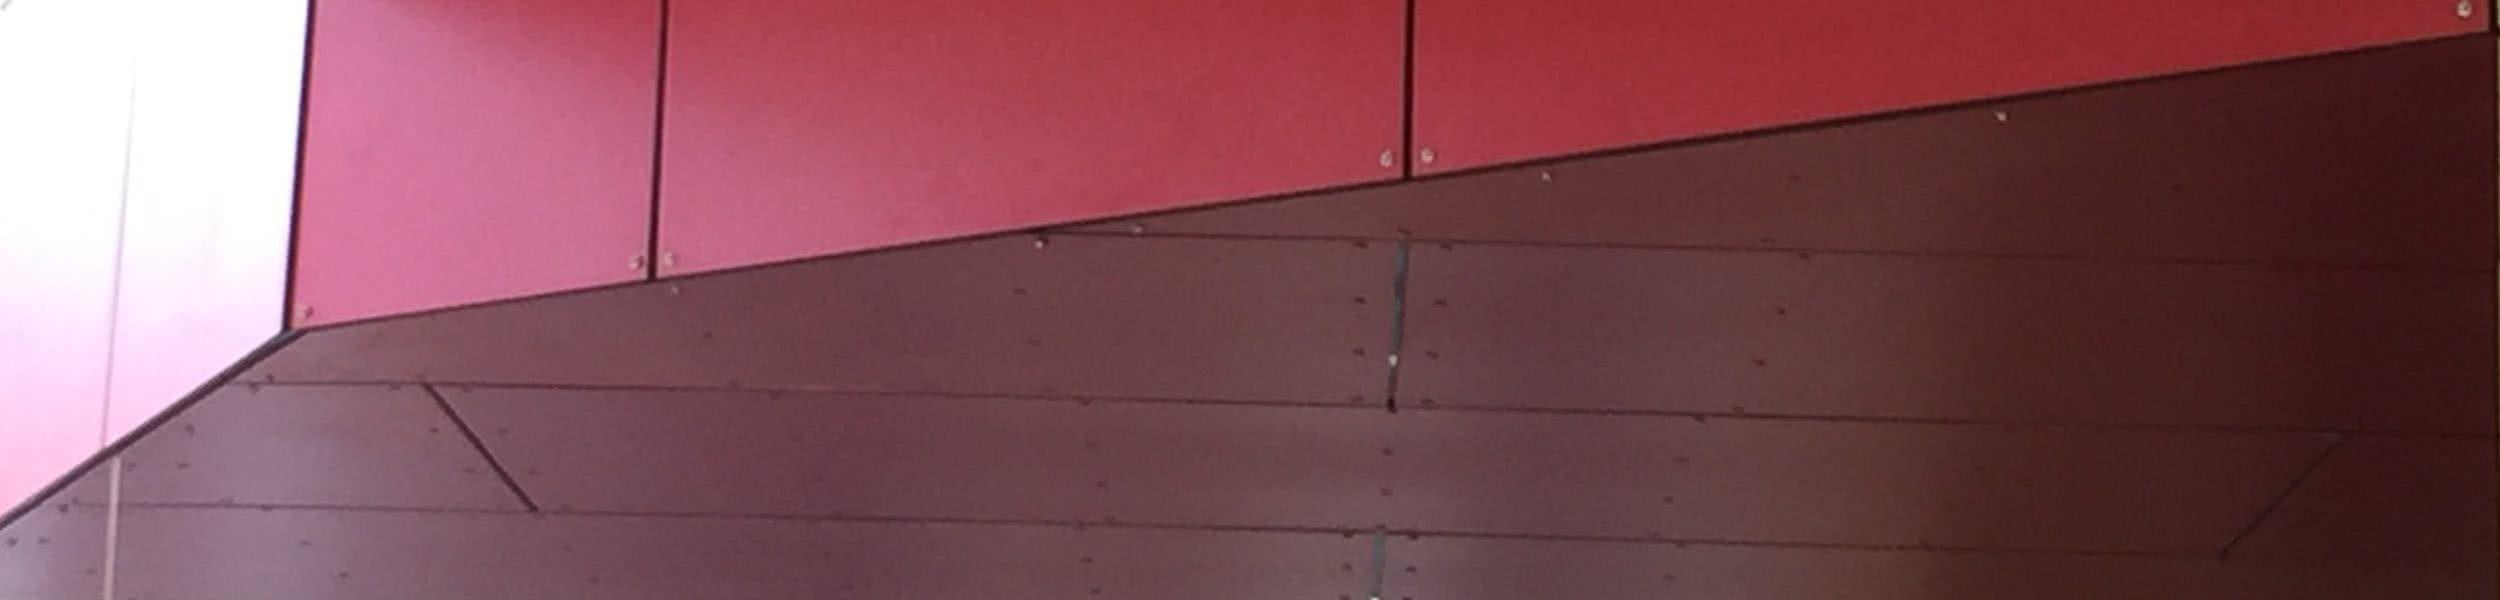 denmac-banksia-senior-high-school-cladding-detail